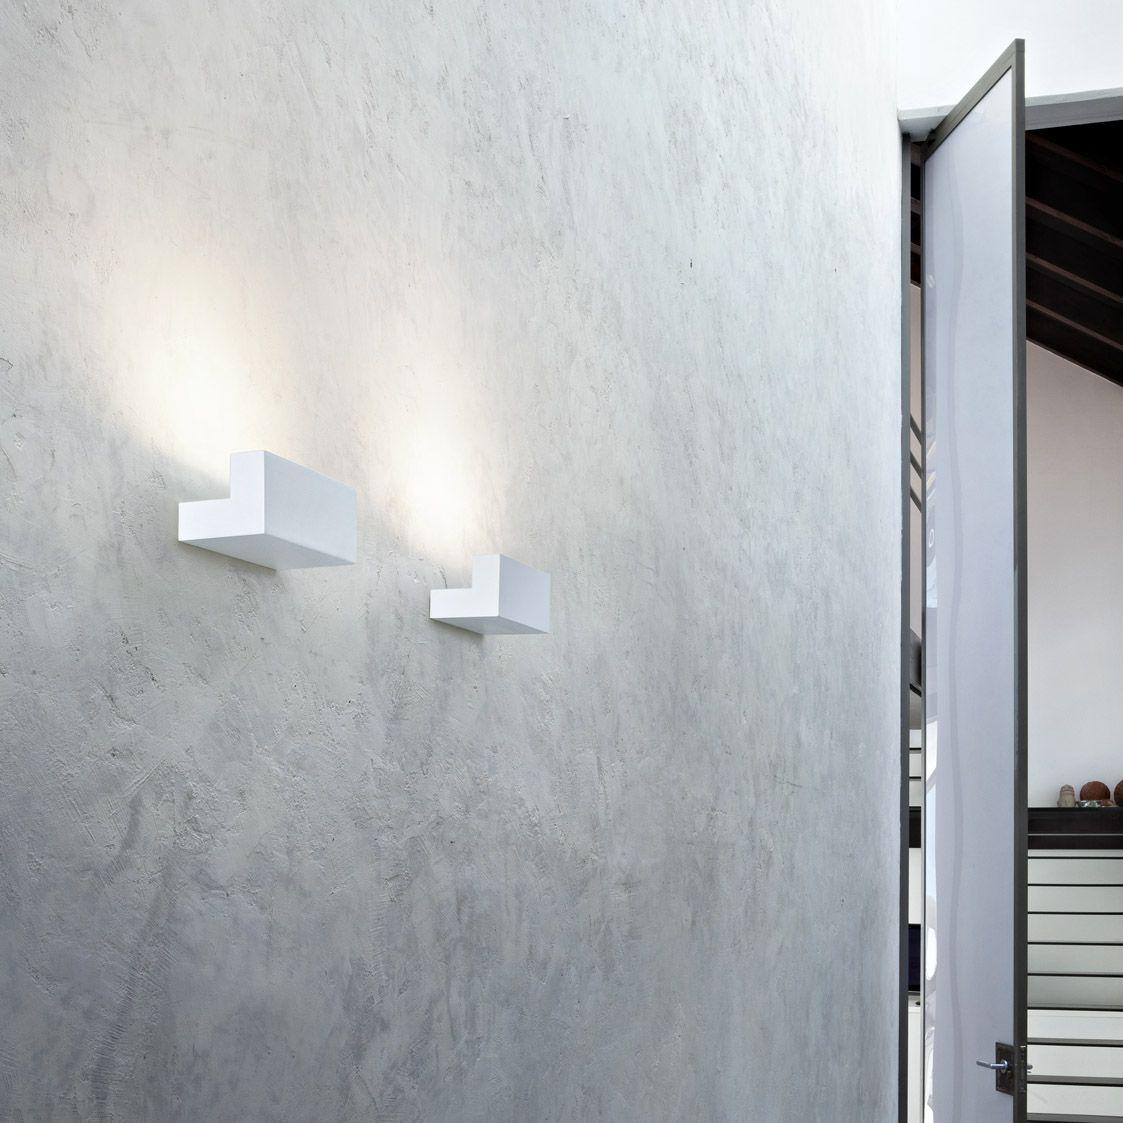 Lighting Long Light By Piero Lissoni Contemporary Designer Lighting By Flos Sourcing Lighting For Various Wandverlichting Binnenverlichting Verlichting